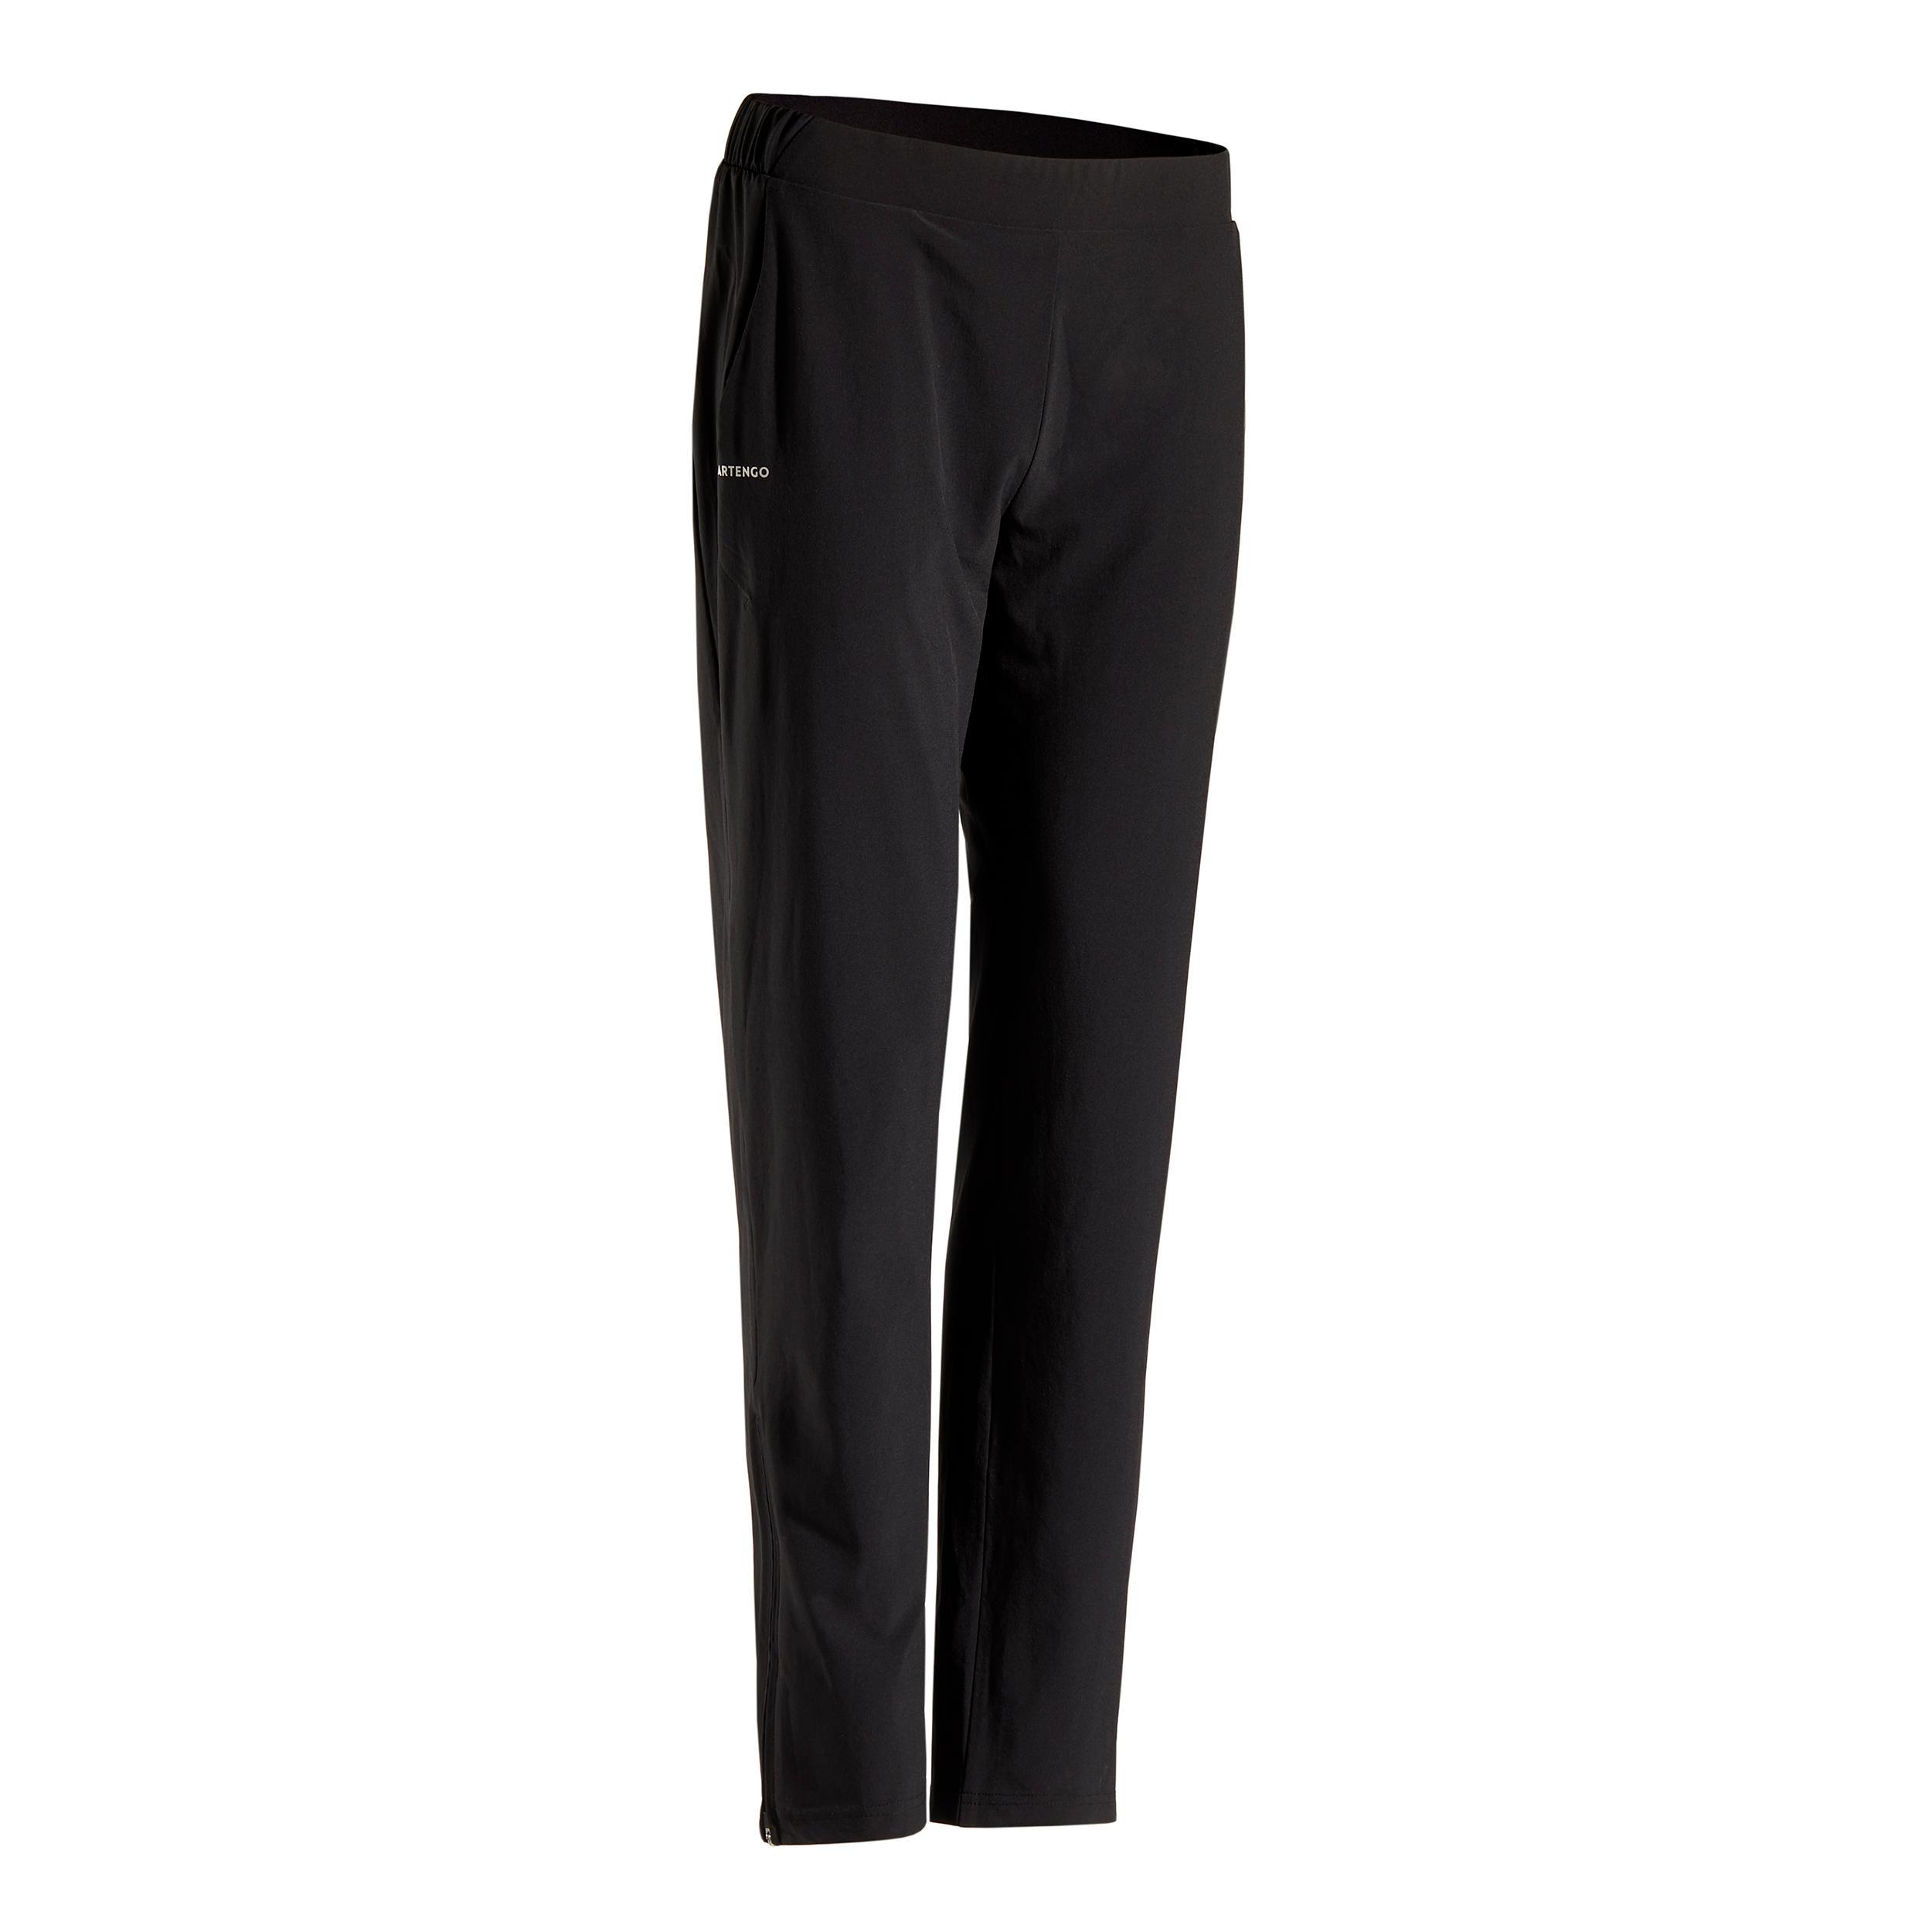 Tennishose PA Dry 500 Damen schwarz | Sportbekleidung > Sporthosen > Tennisshorts | Schwarz | Artengo